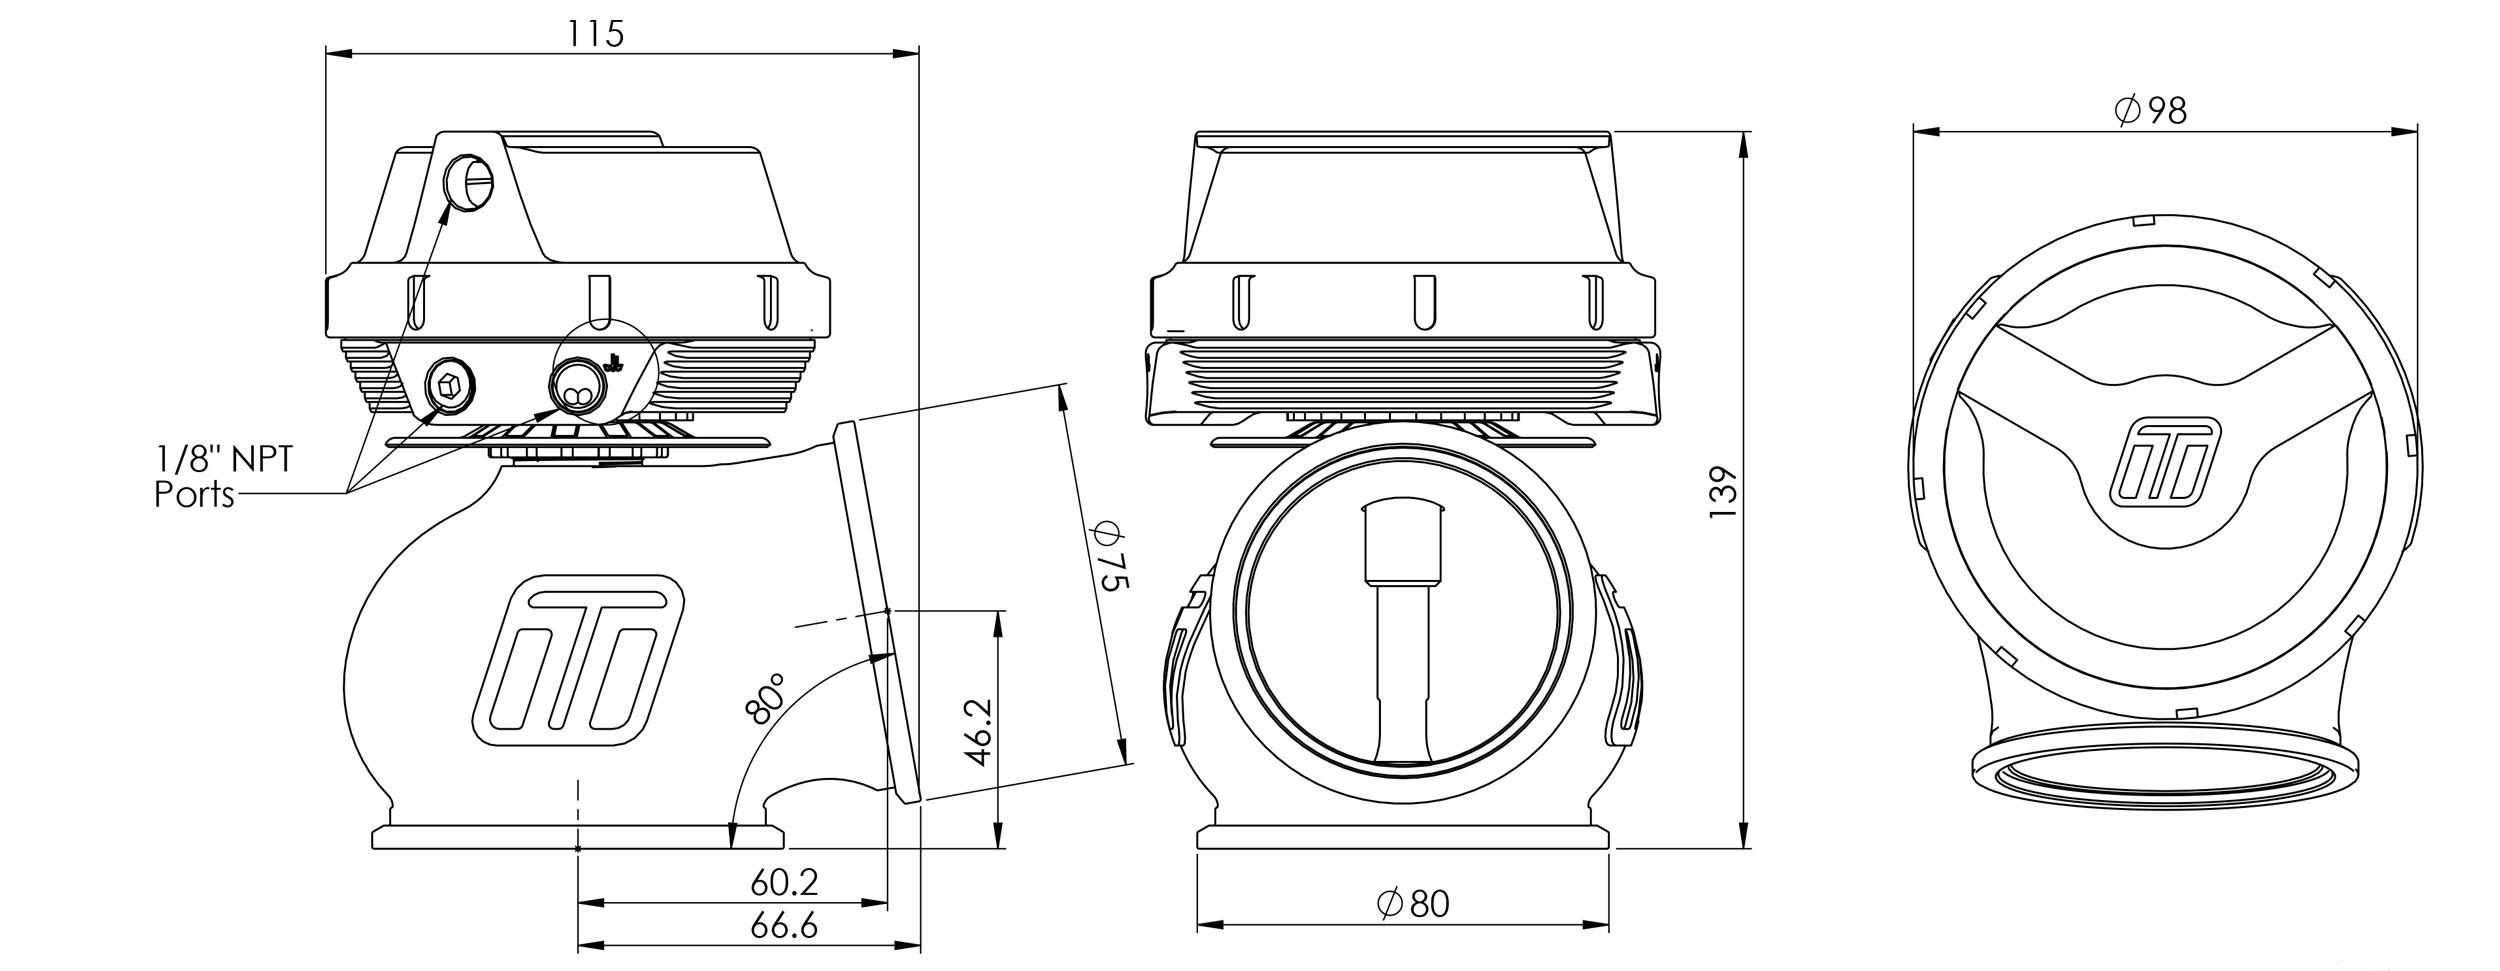 Turbosmart 60mm wastegate ritning